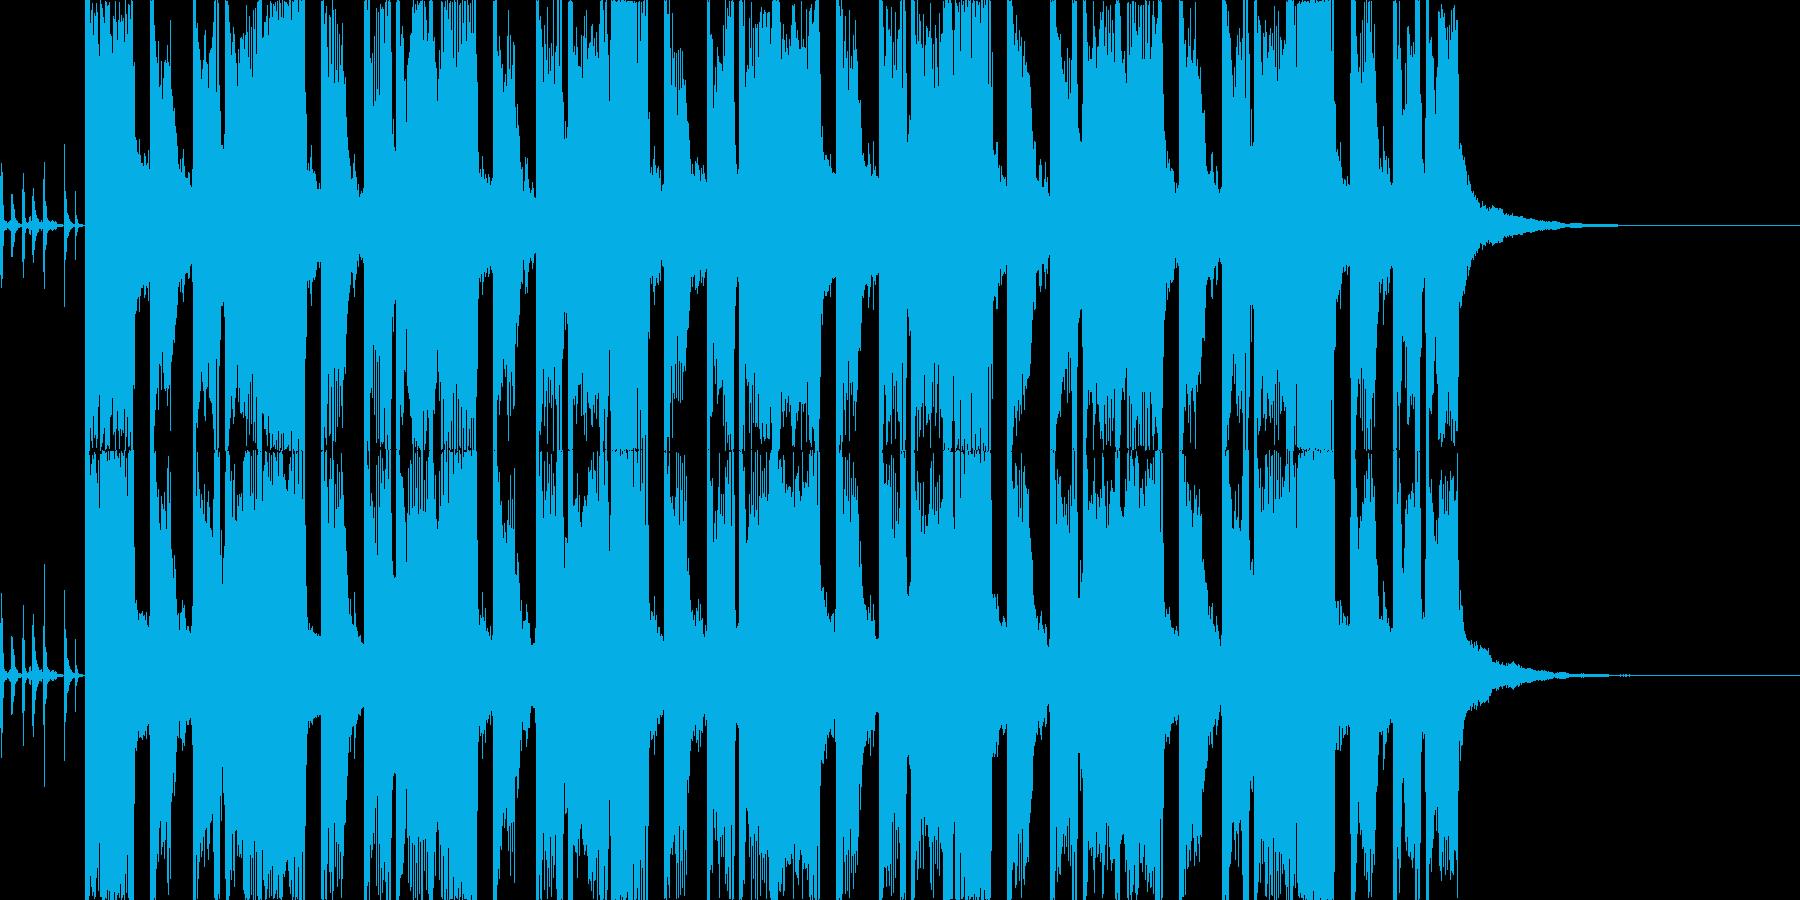 FuturePop、洋楽、ポップス、夏cの再生済みの波形